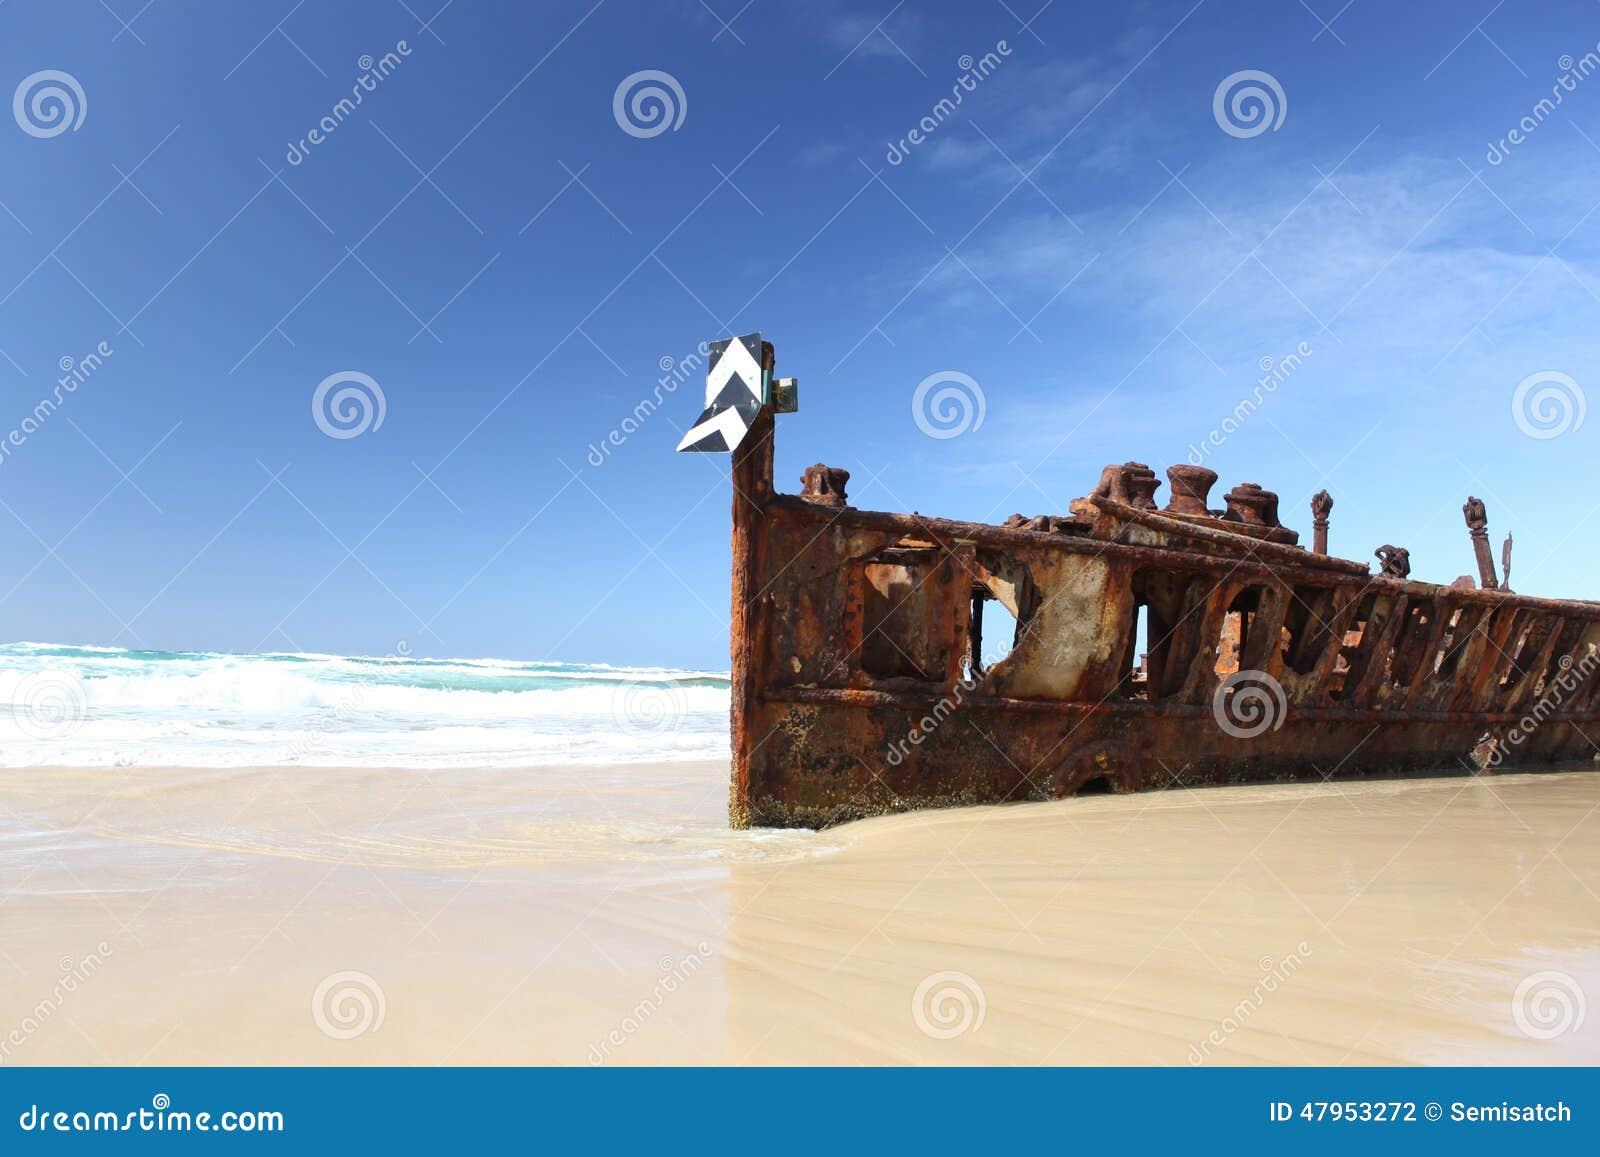 The Maheno shipwreck, Fraser Island, Queensland, Australia